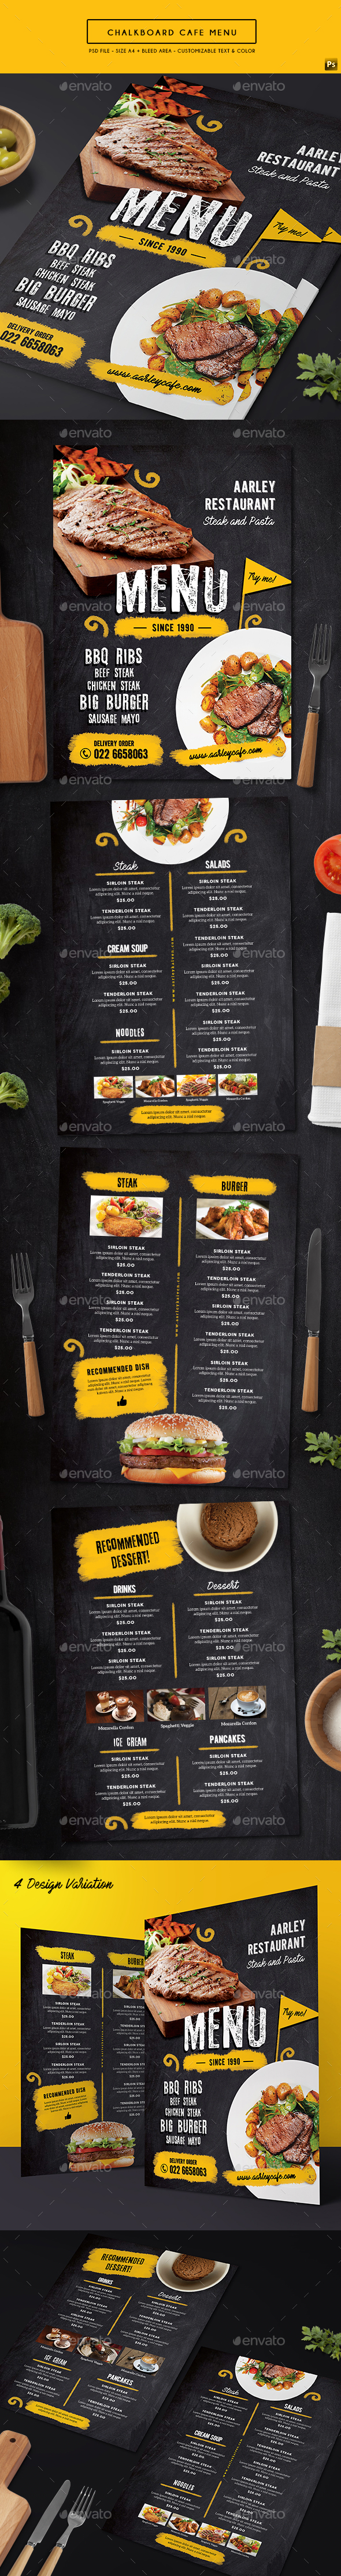 Chalkboard Cafe Menu - Food Menus Print Templates